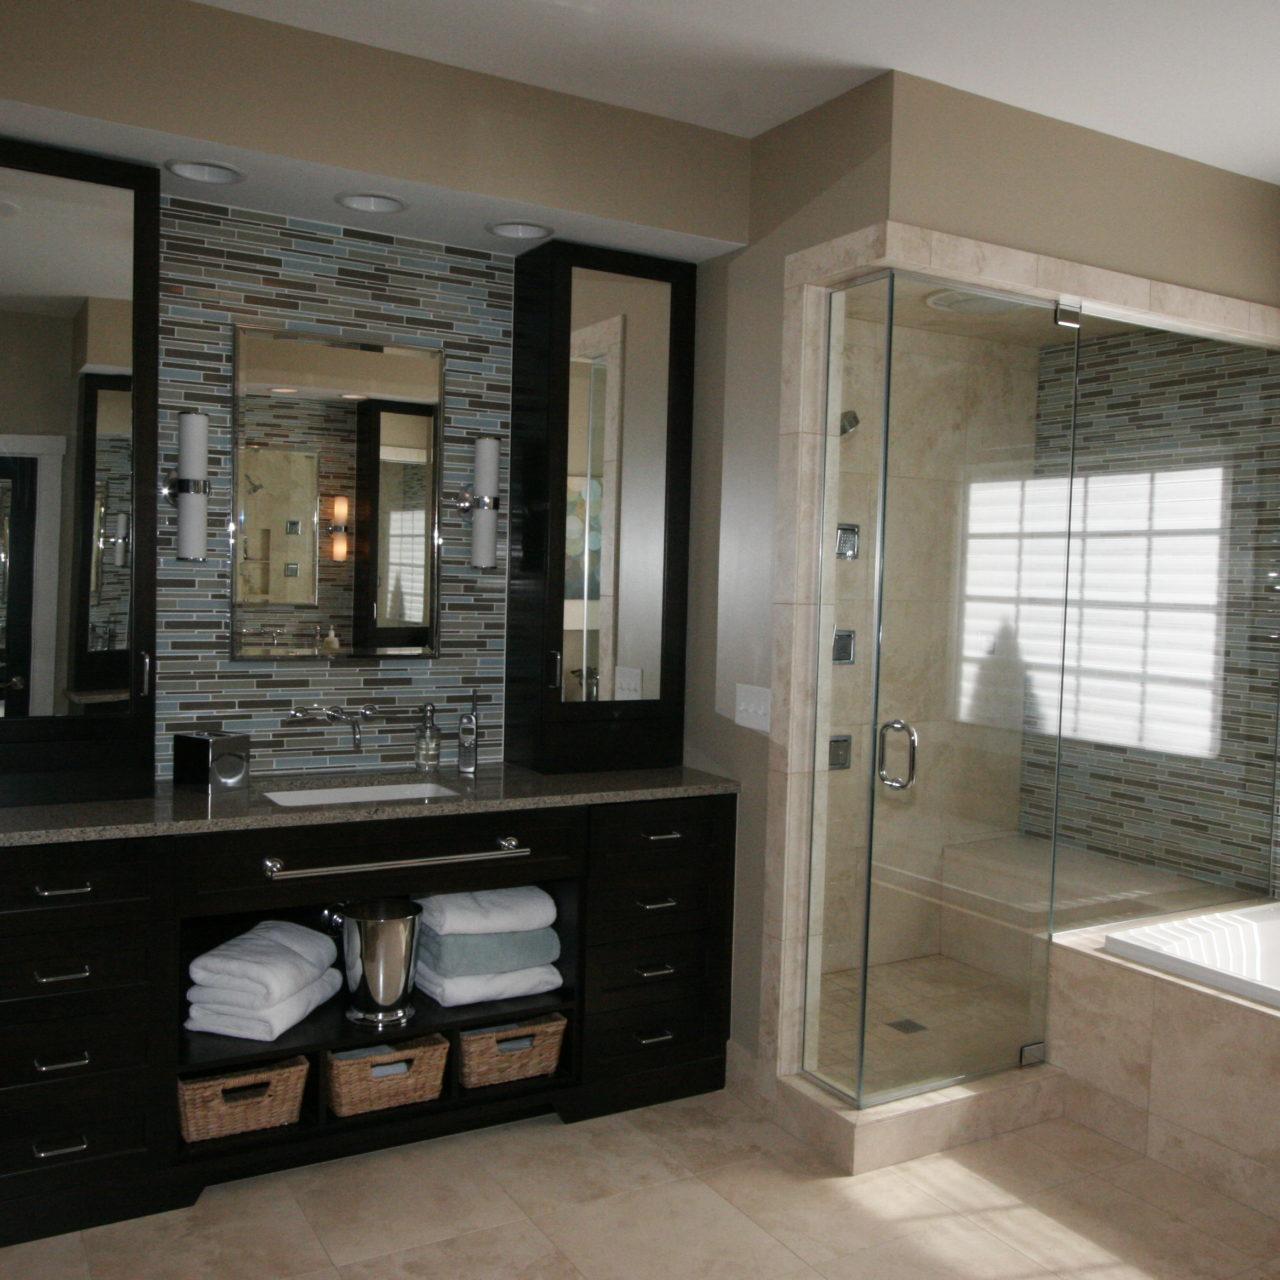 http://creativecabinetryinc.com/wp-content/uploads/2016/12/p-bathroom-vanity-contemporary-shaker-retro-design.-1280x1280.jpg